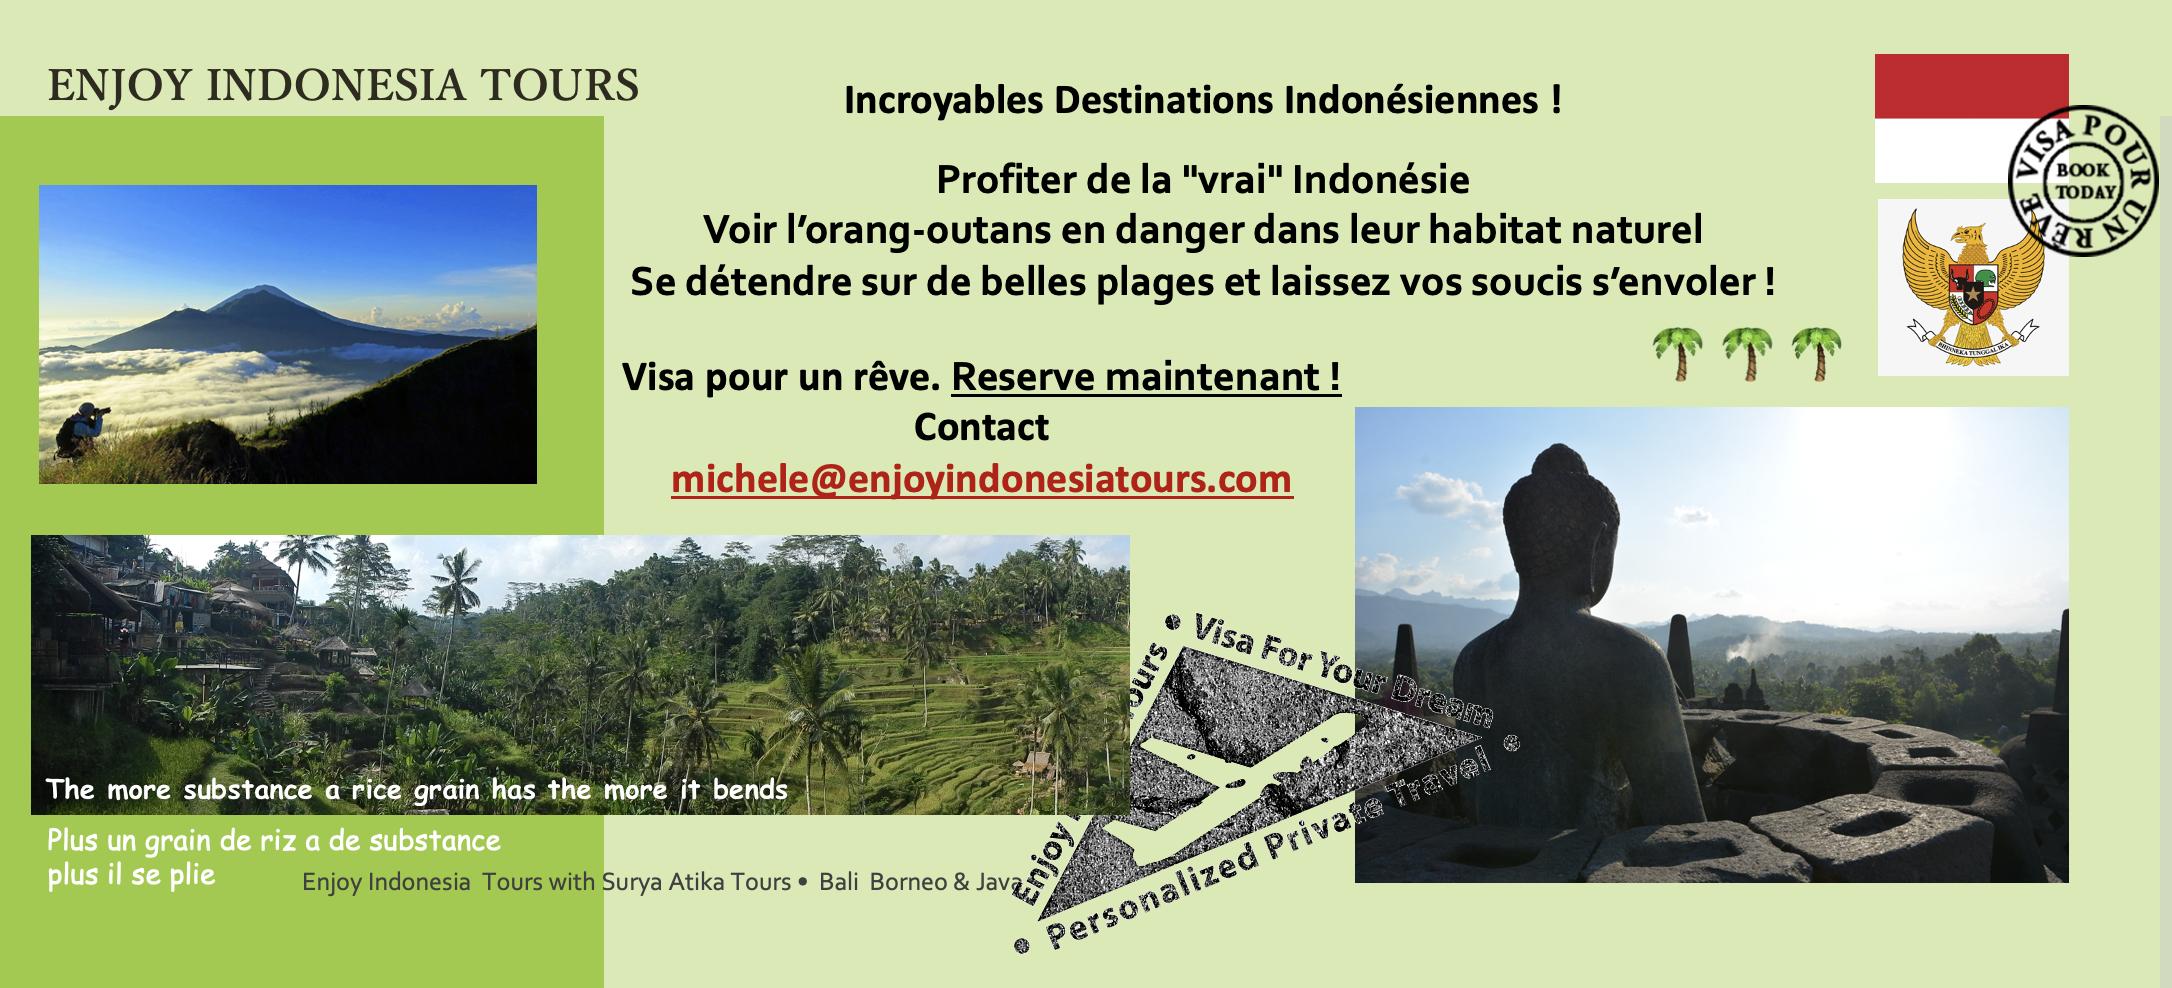 Enjoy Indonesia Tours Bali Borneo Java French Pg 4